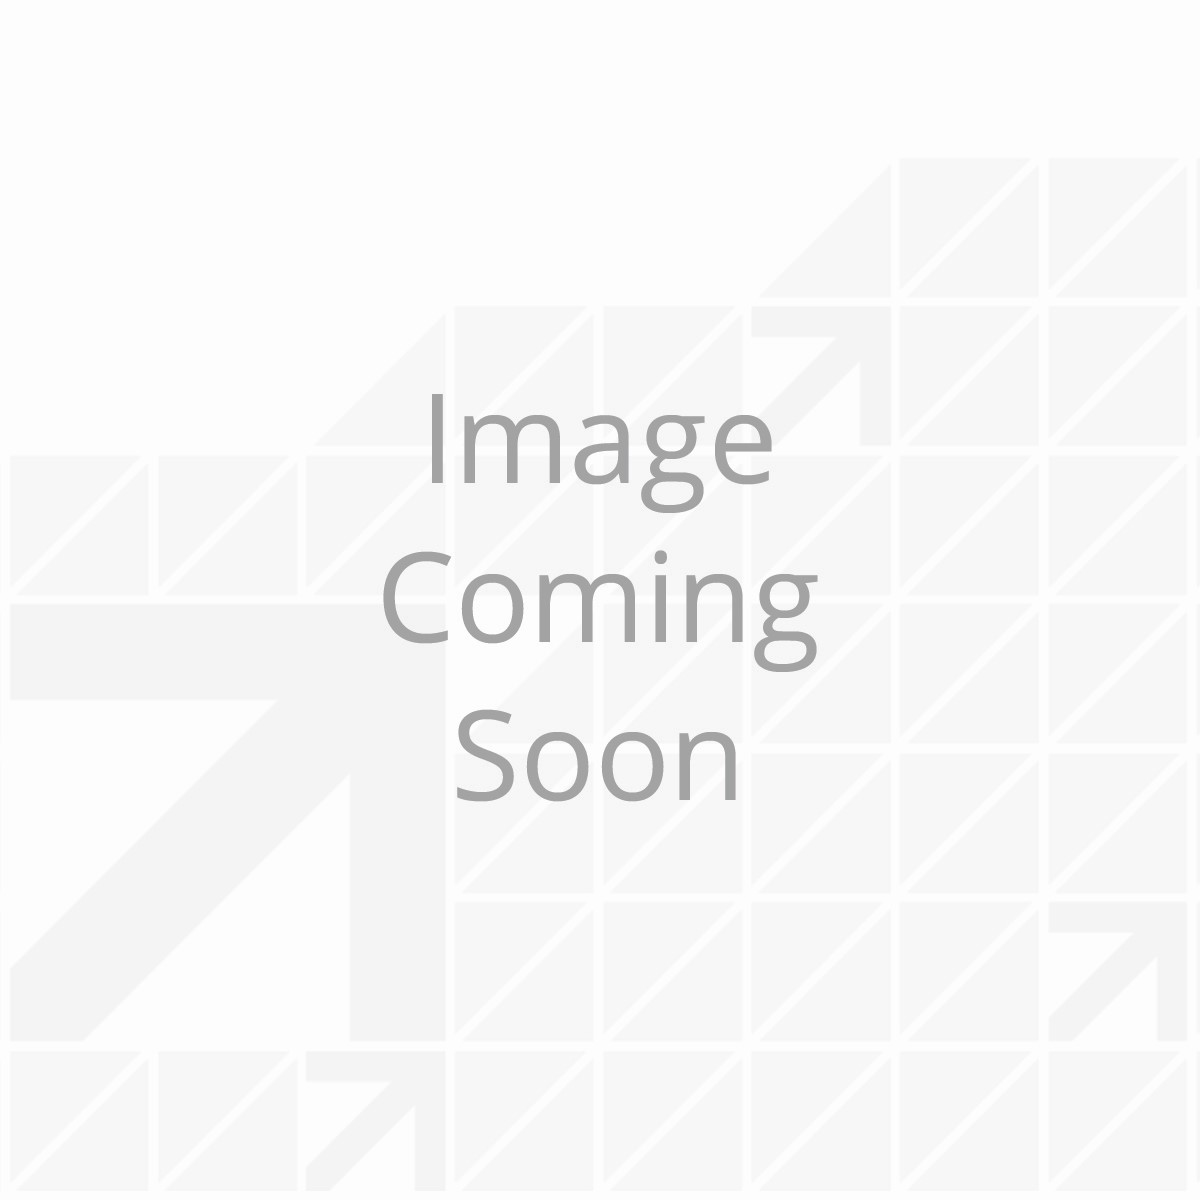 "Short Trunnion Bar Weight Distribution Hitch (8K - 10K lbs., 28-3/8"" Bars)"